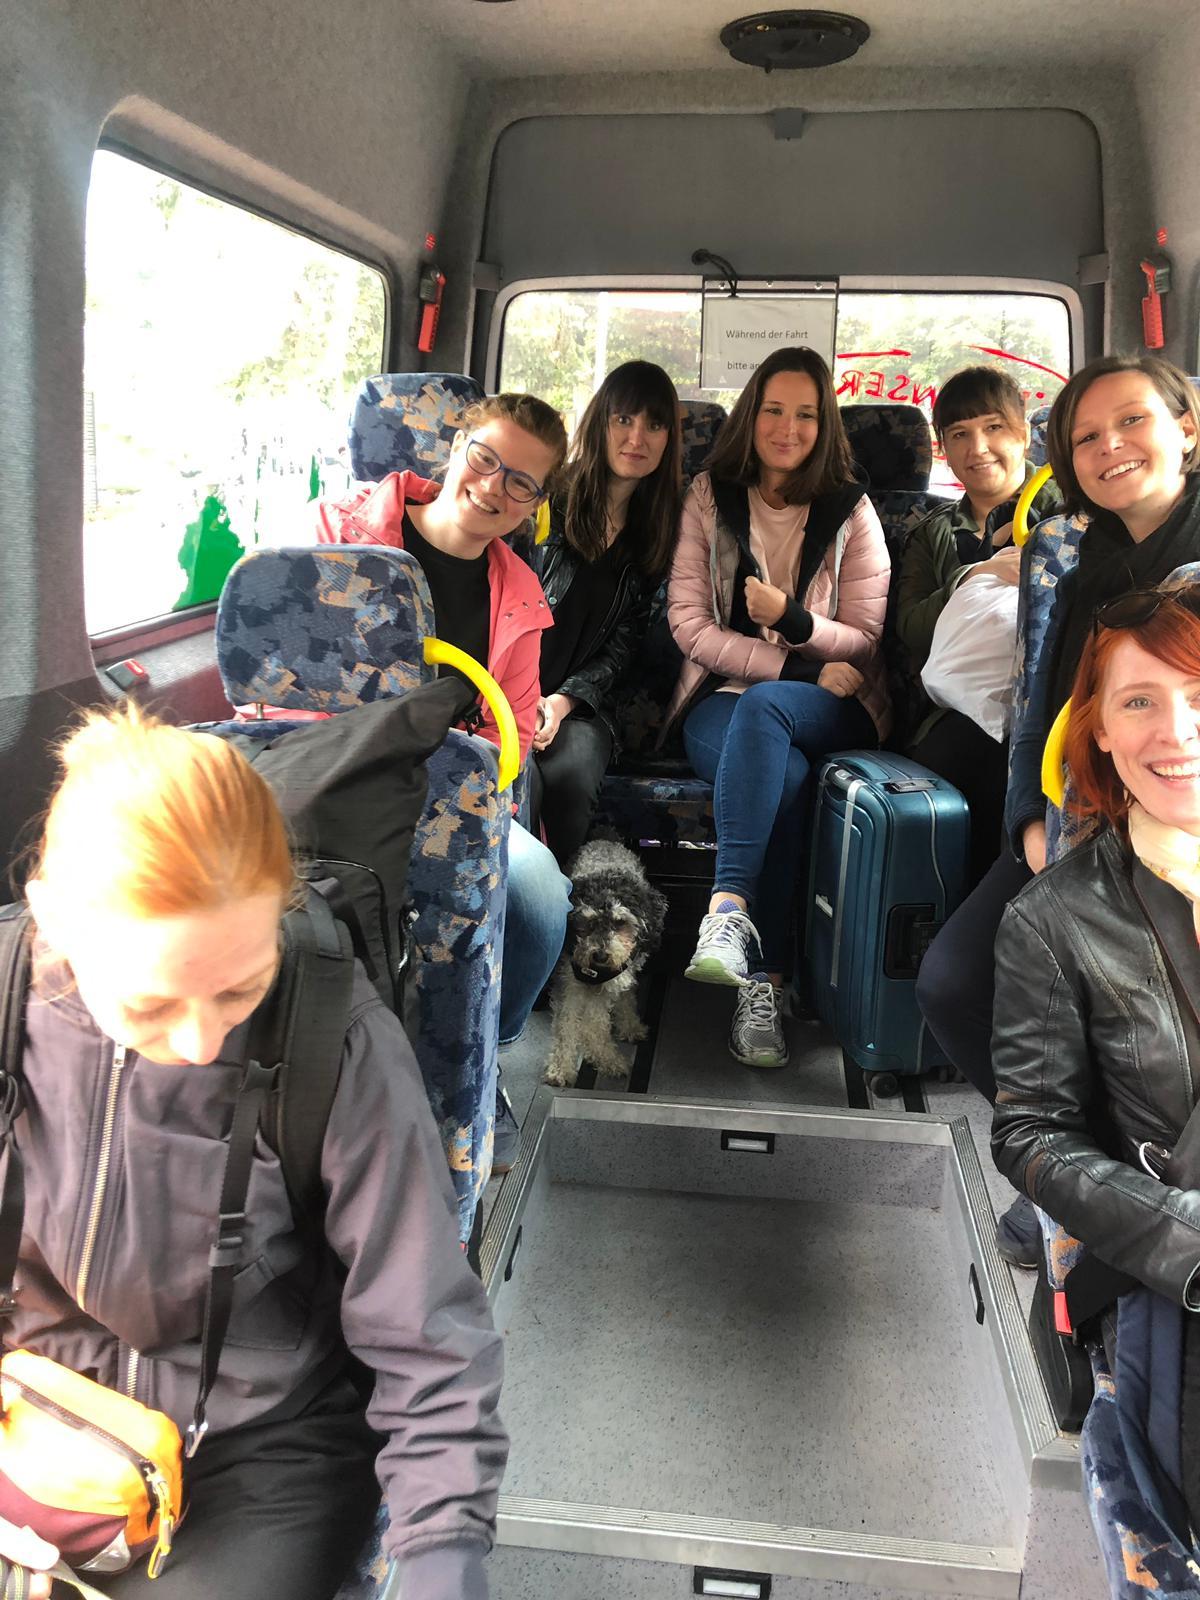 coconat_team in bus.jpg